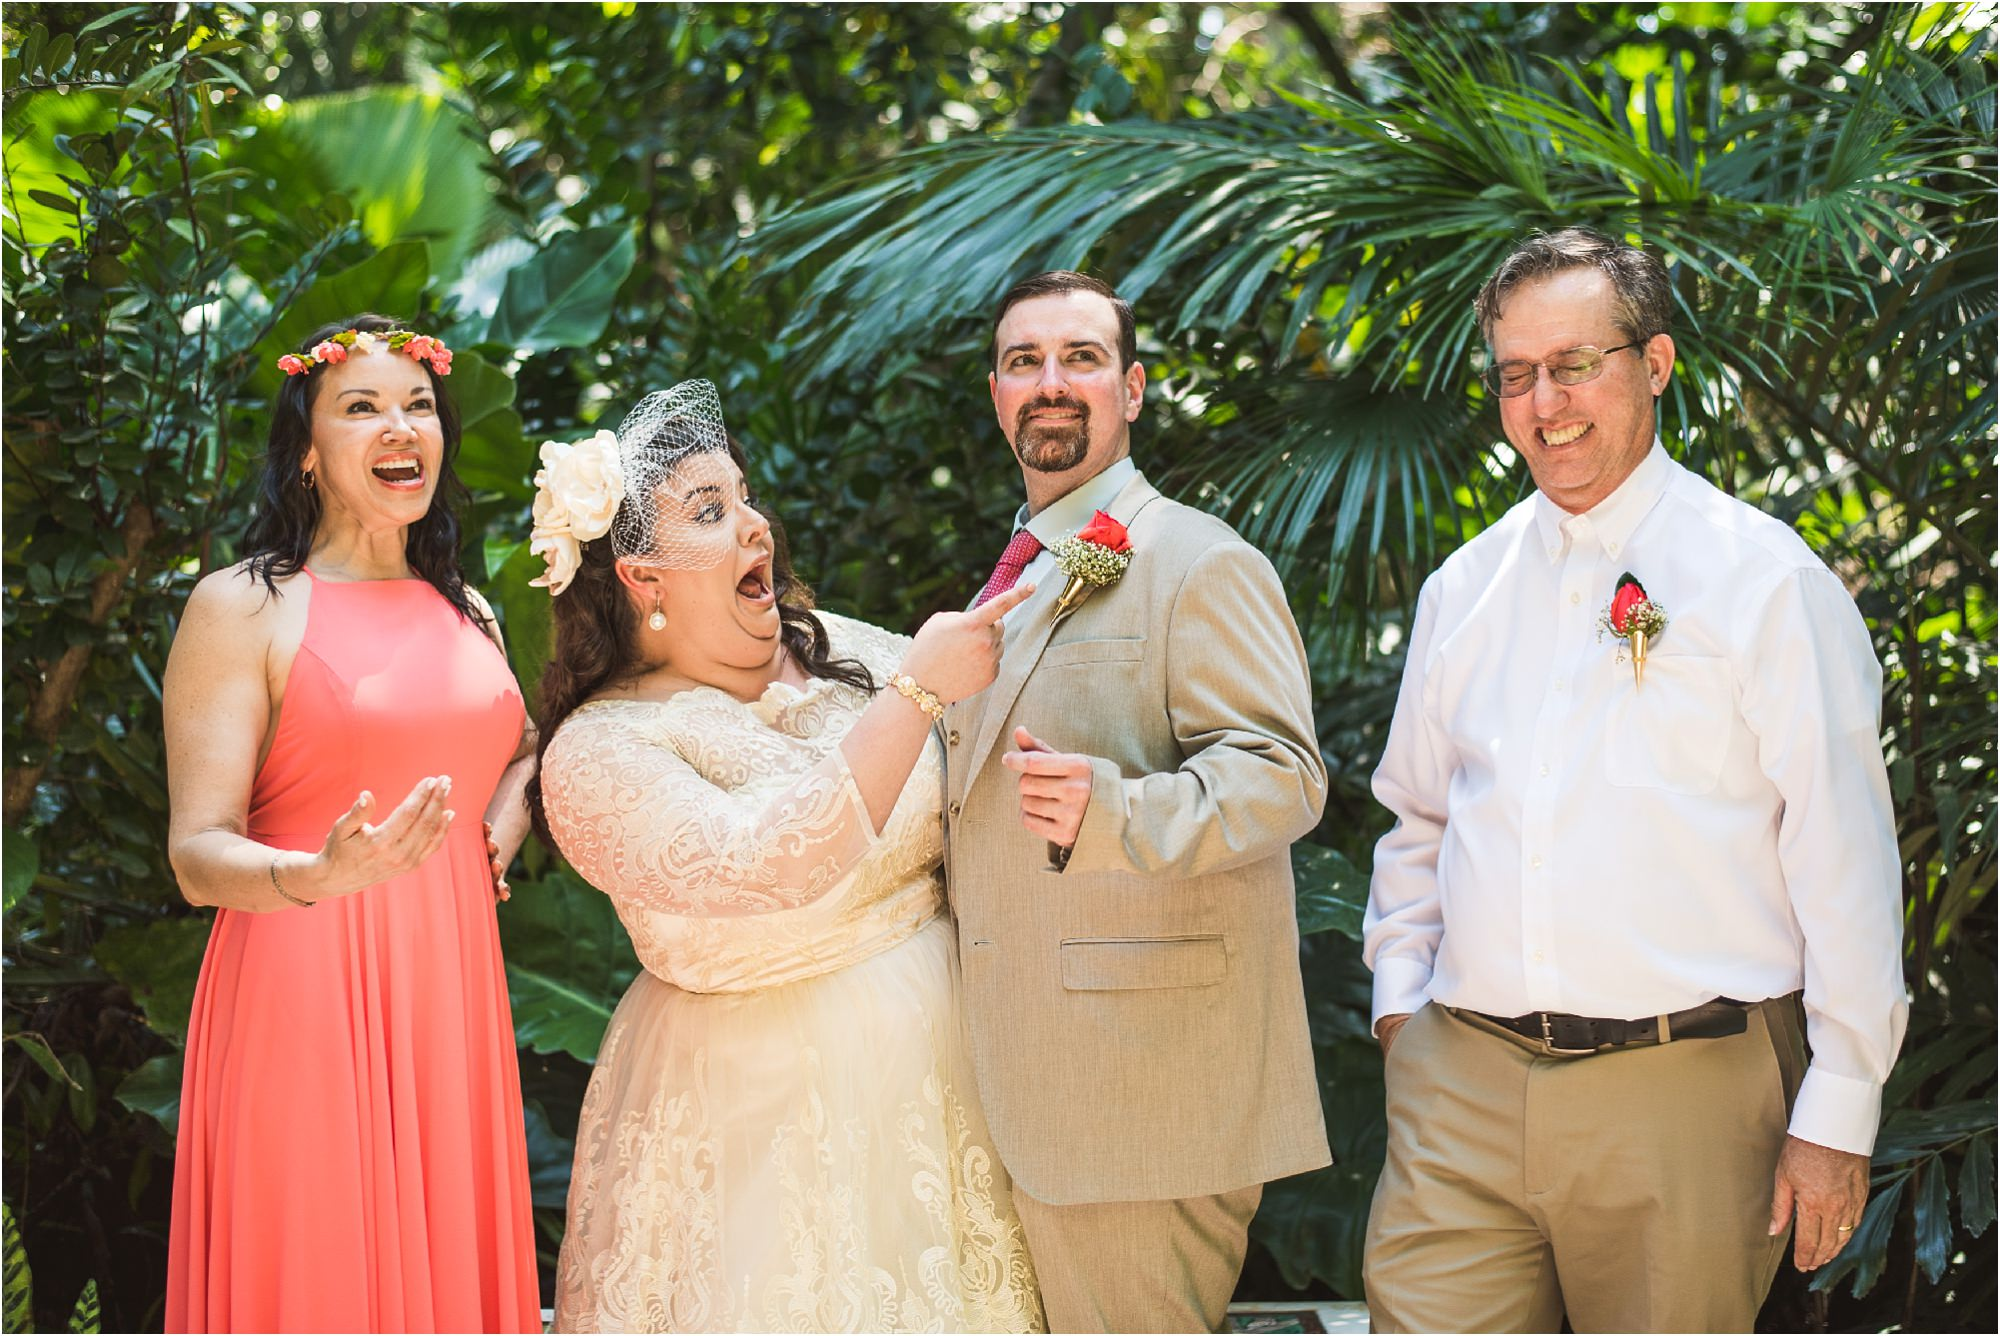 fun-wedding-party-portrait